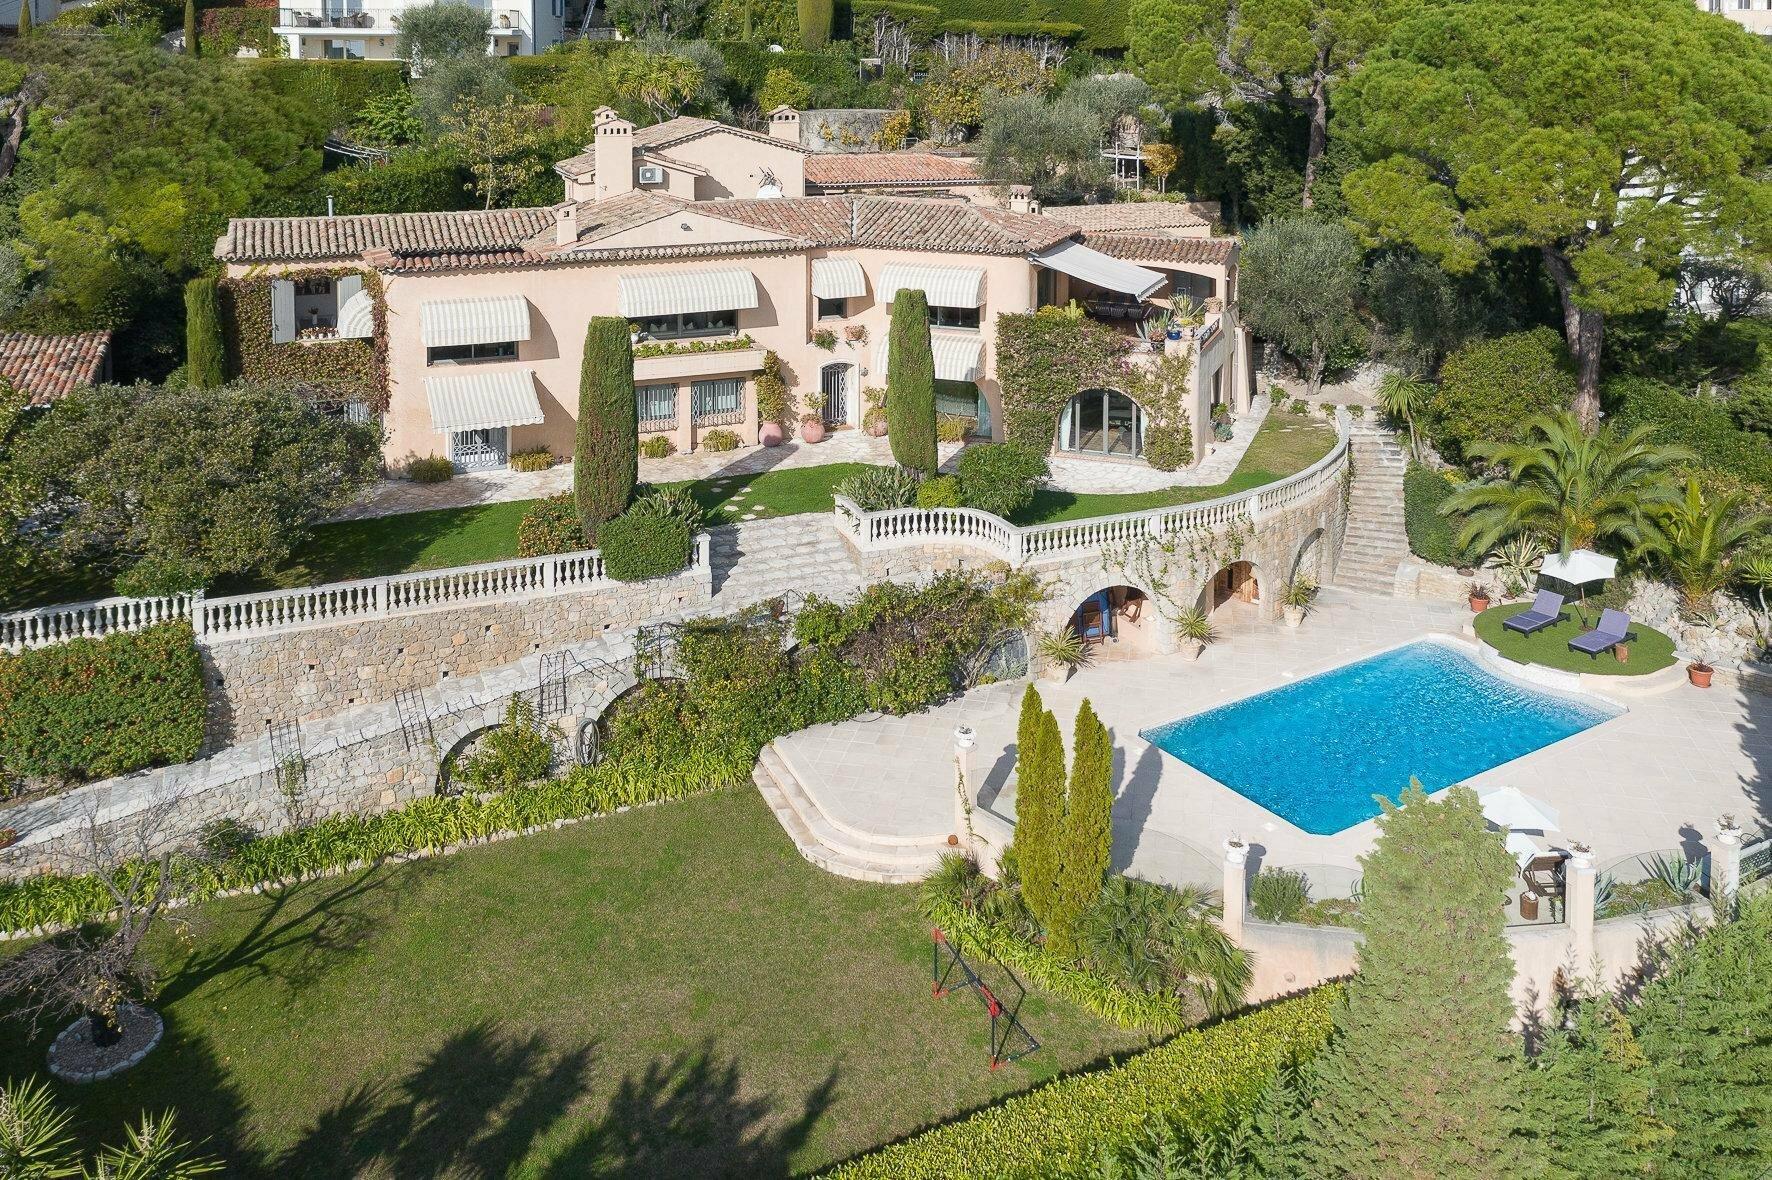 Villa in Mougins, Provence-Alpes-Côte d'Azur, France 1 - 11202230